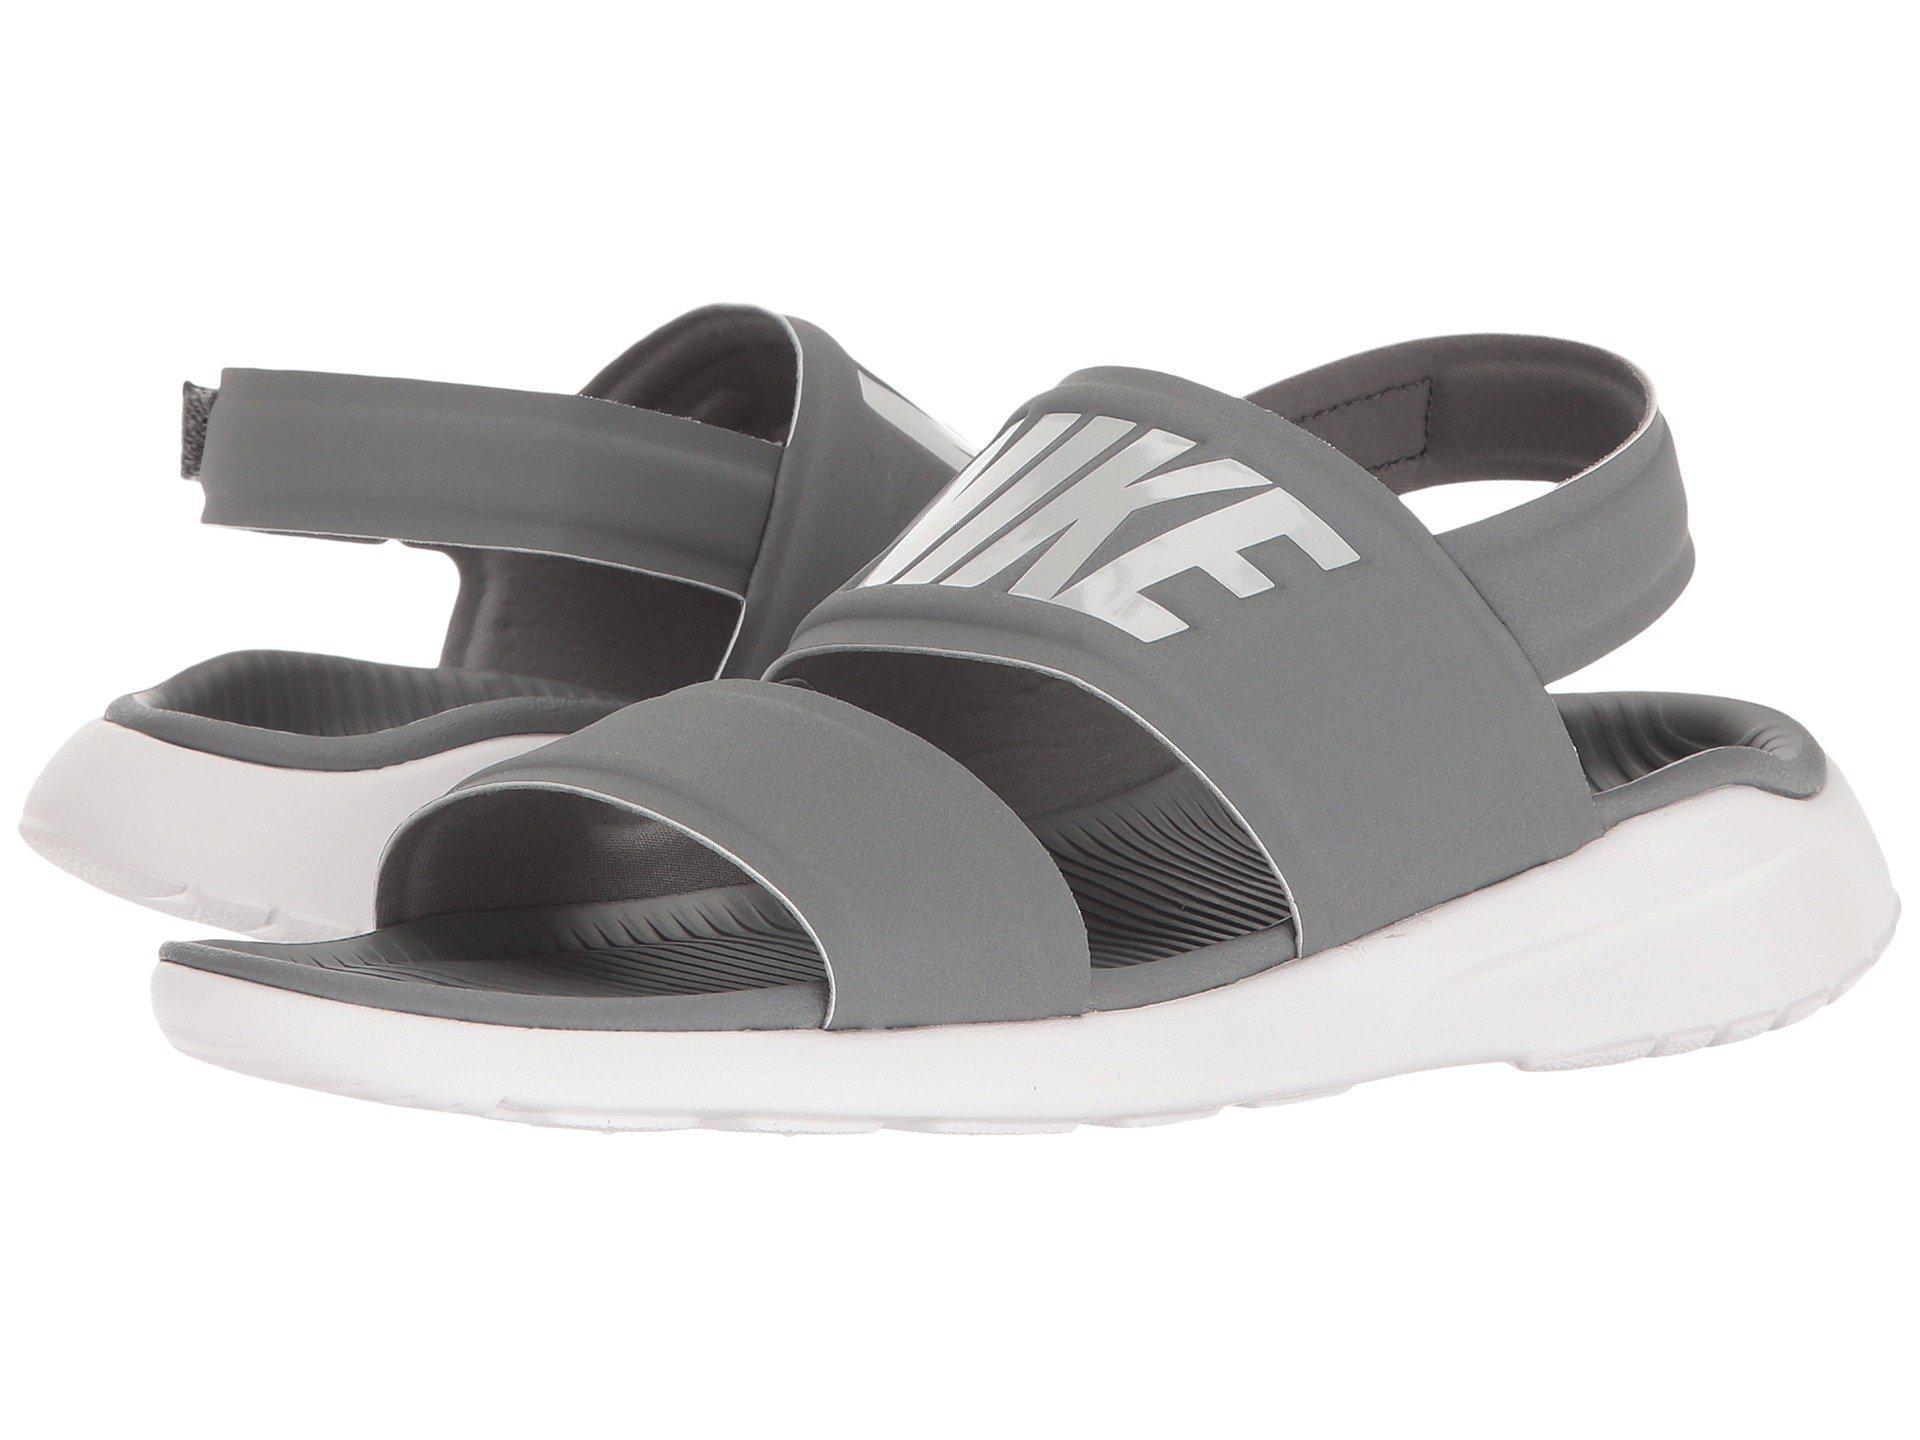 online store d6485 4d19e switzerland womens sandals academy 15ca1 2cb2f  coupon lyst nike tanjun  sandal black black white womens shoes in gray e768f f572e